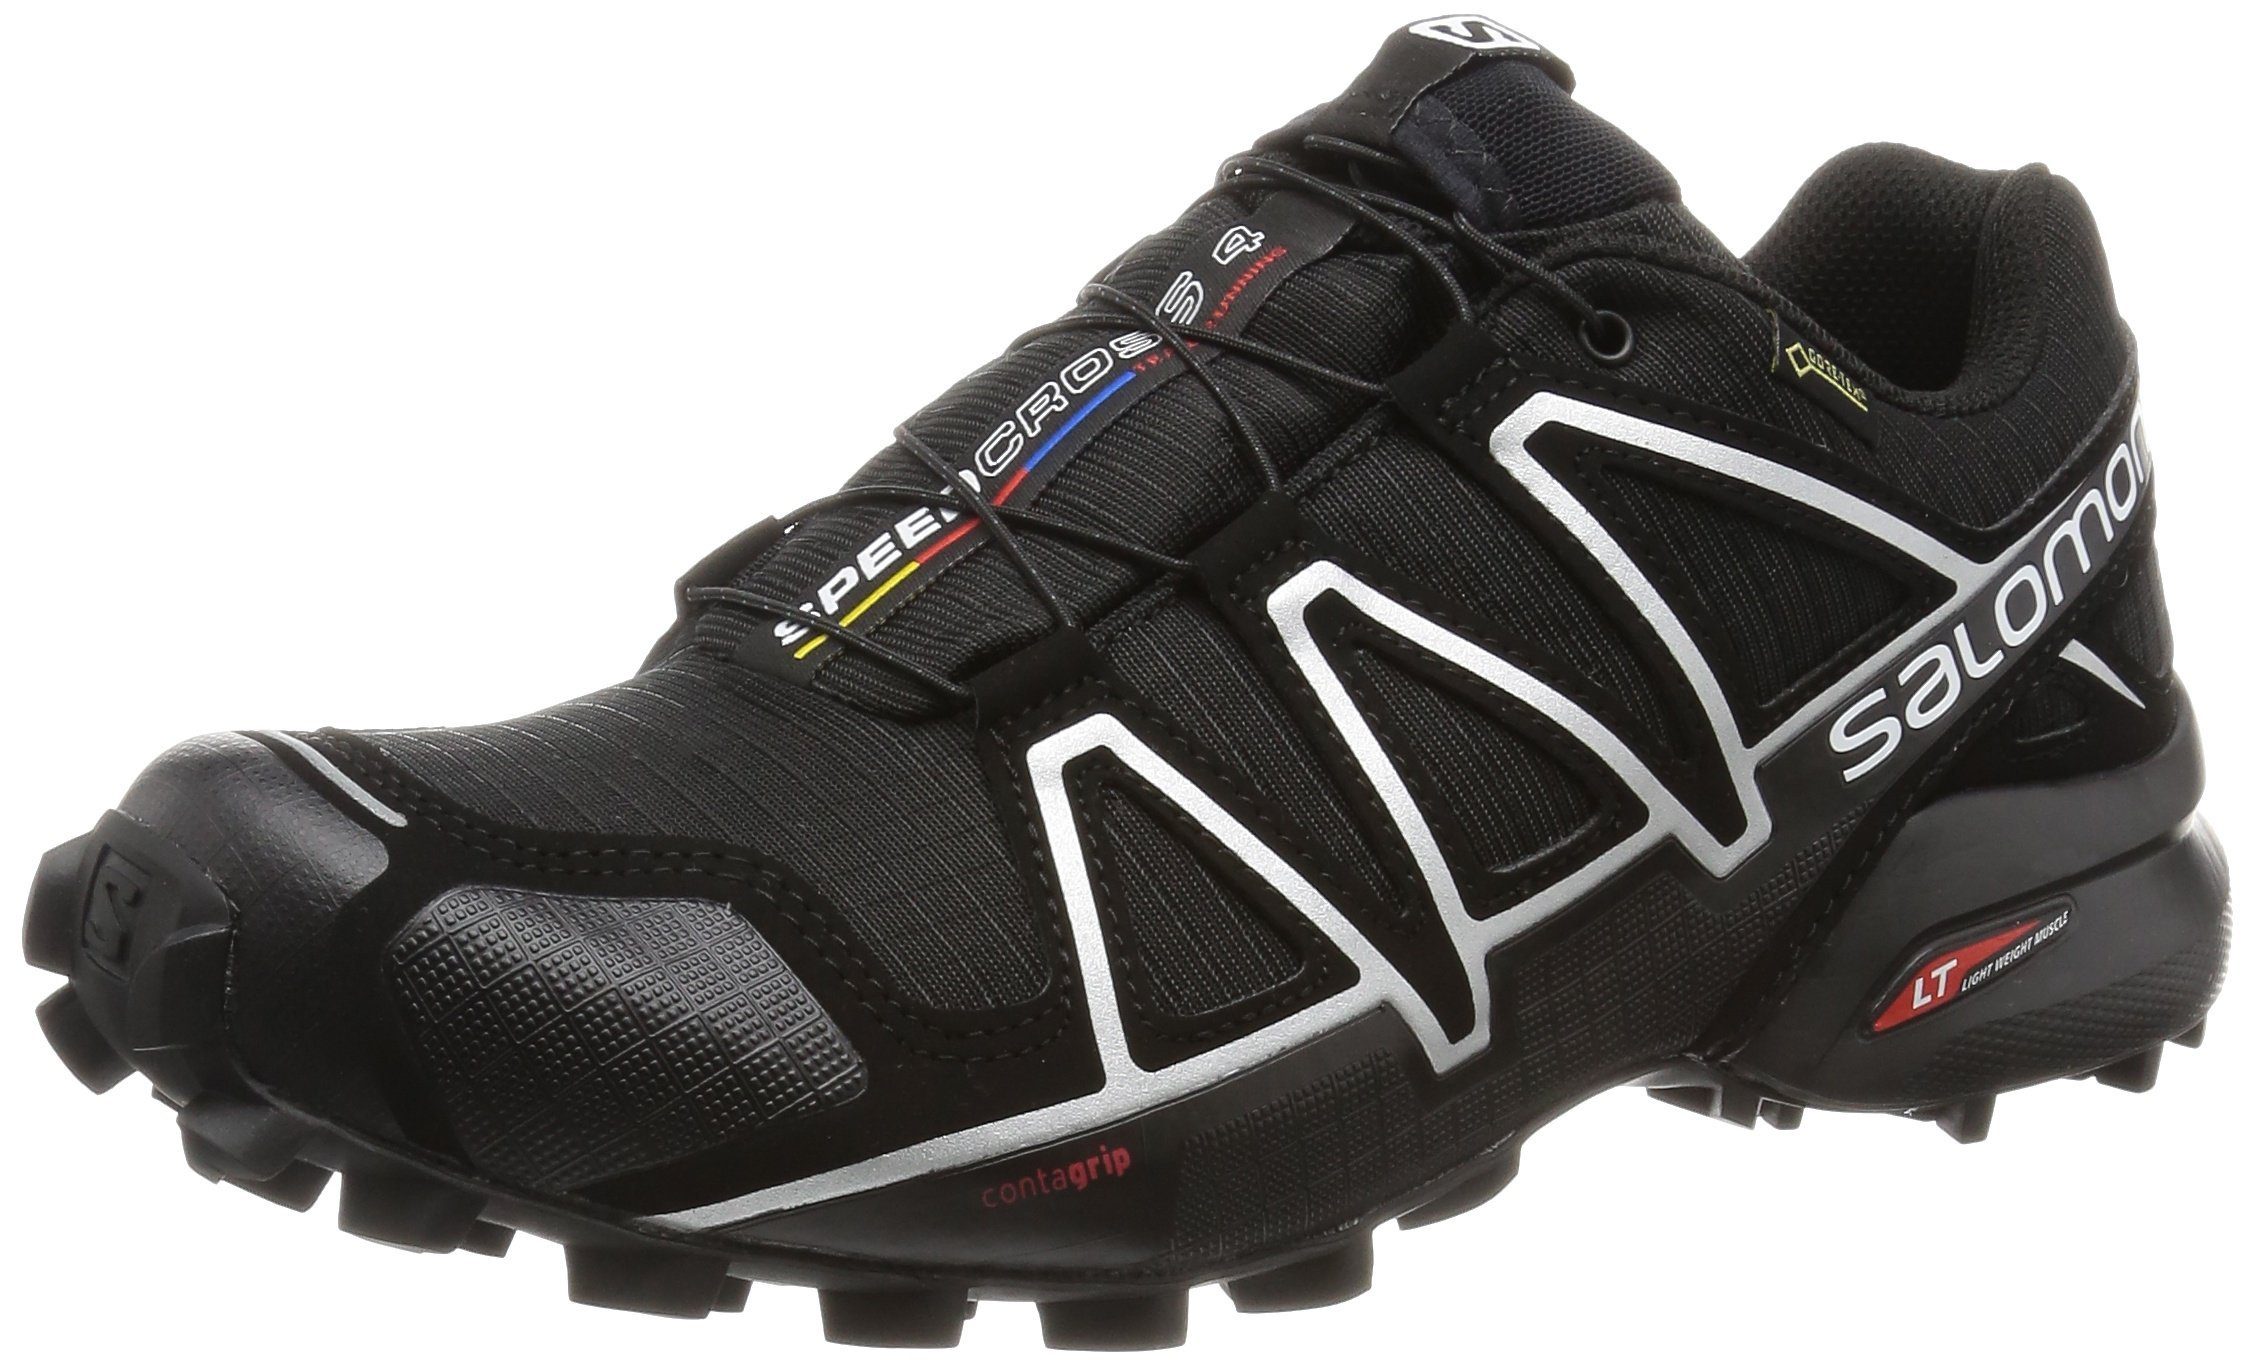 Salomon Men's Speedcross 4 GTX Trail Running Shoes, Black/Black/SILVER METALLIC-X, 10.5 by SALOMON